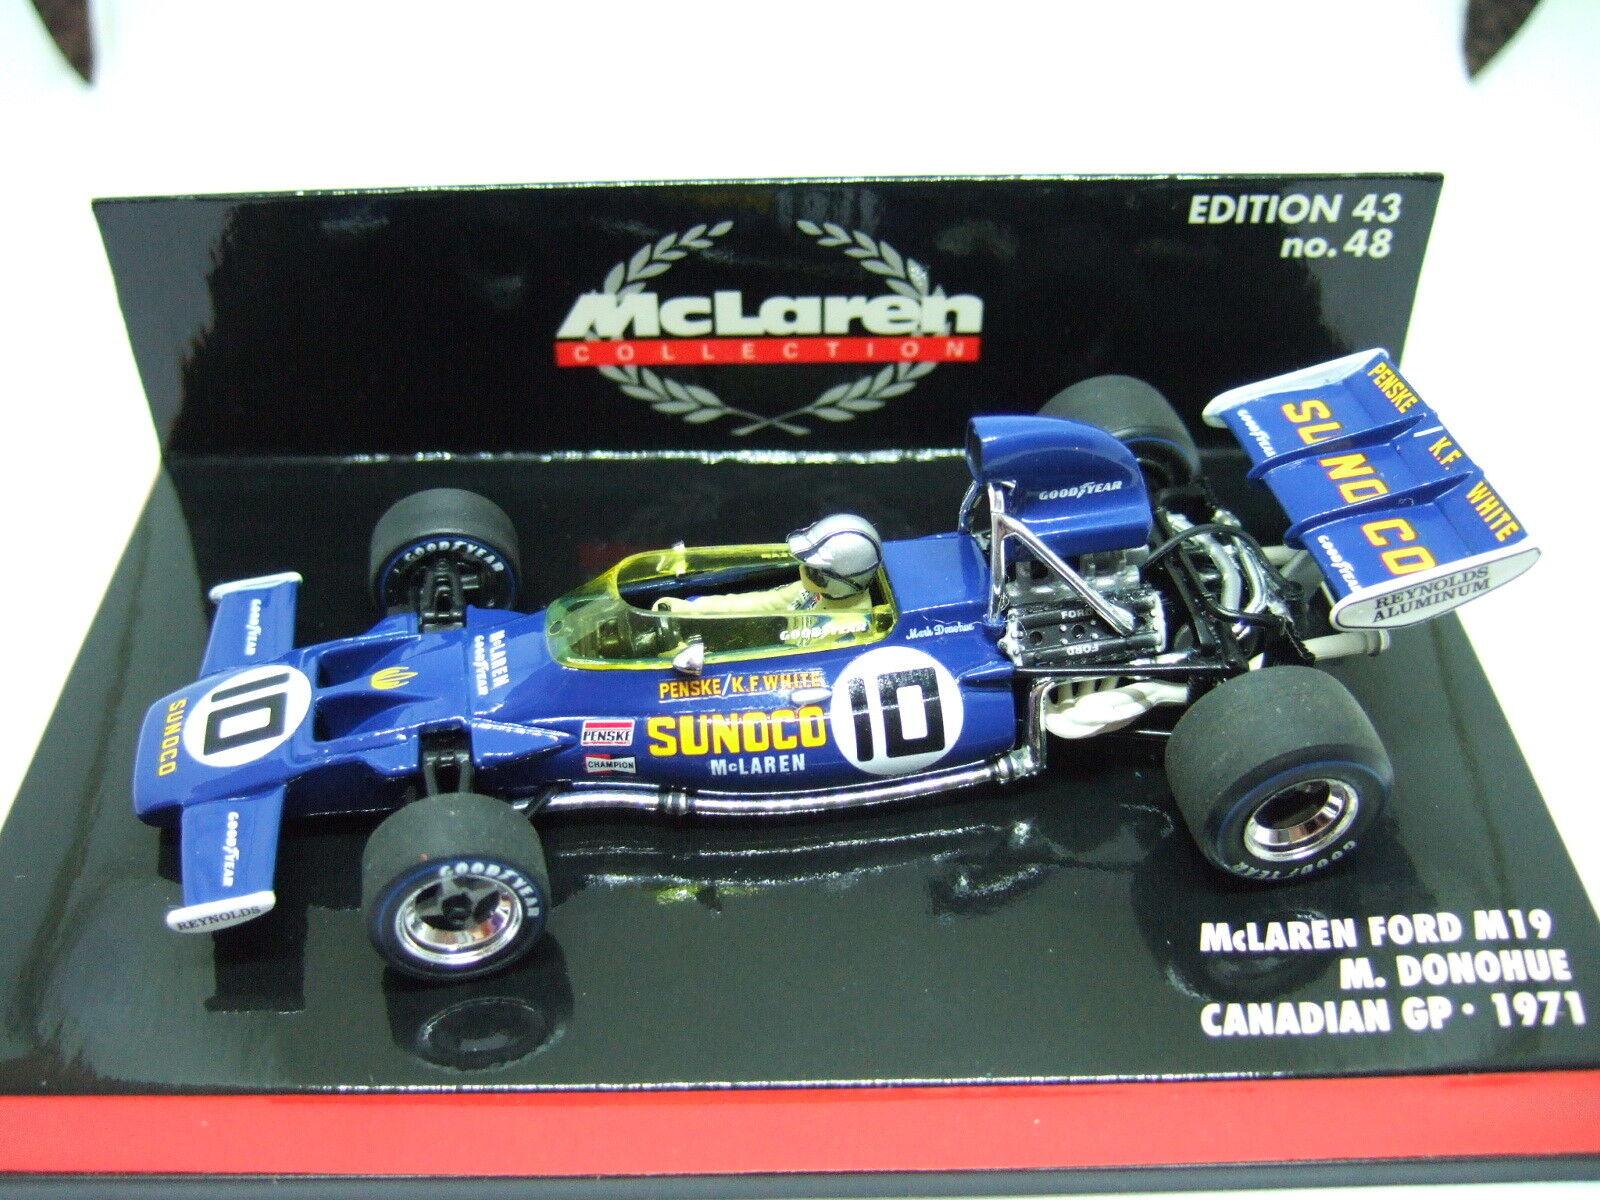 MINICHAMPS Mark Donohue McLaren Ford M19 Canadian GP 1971 1 43